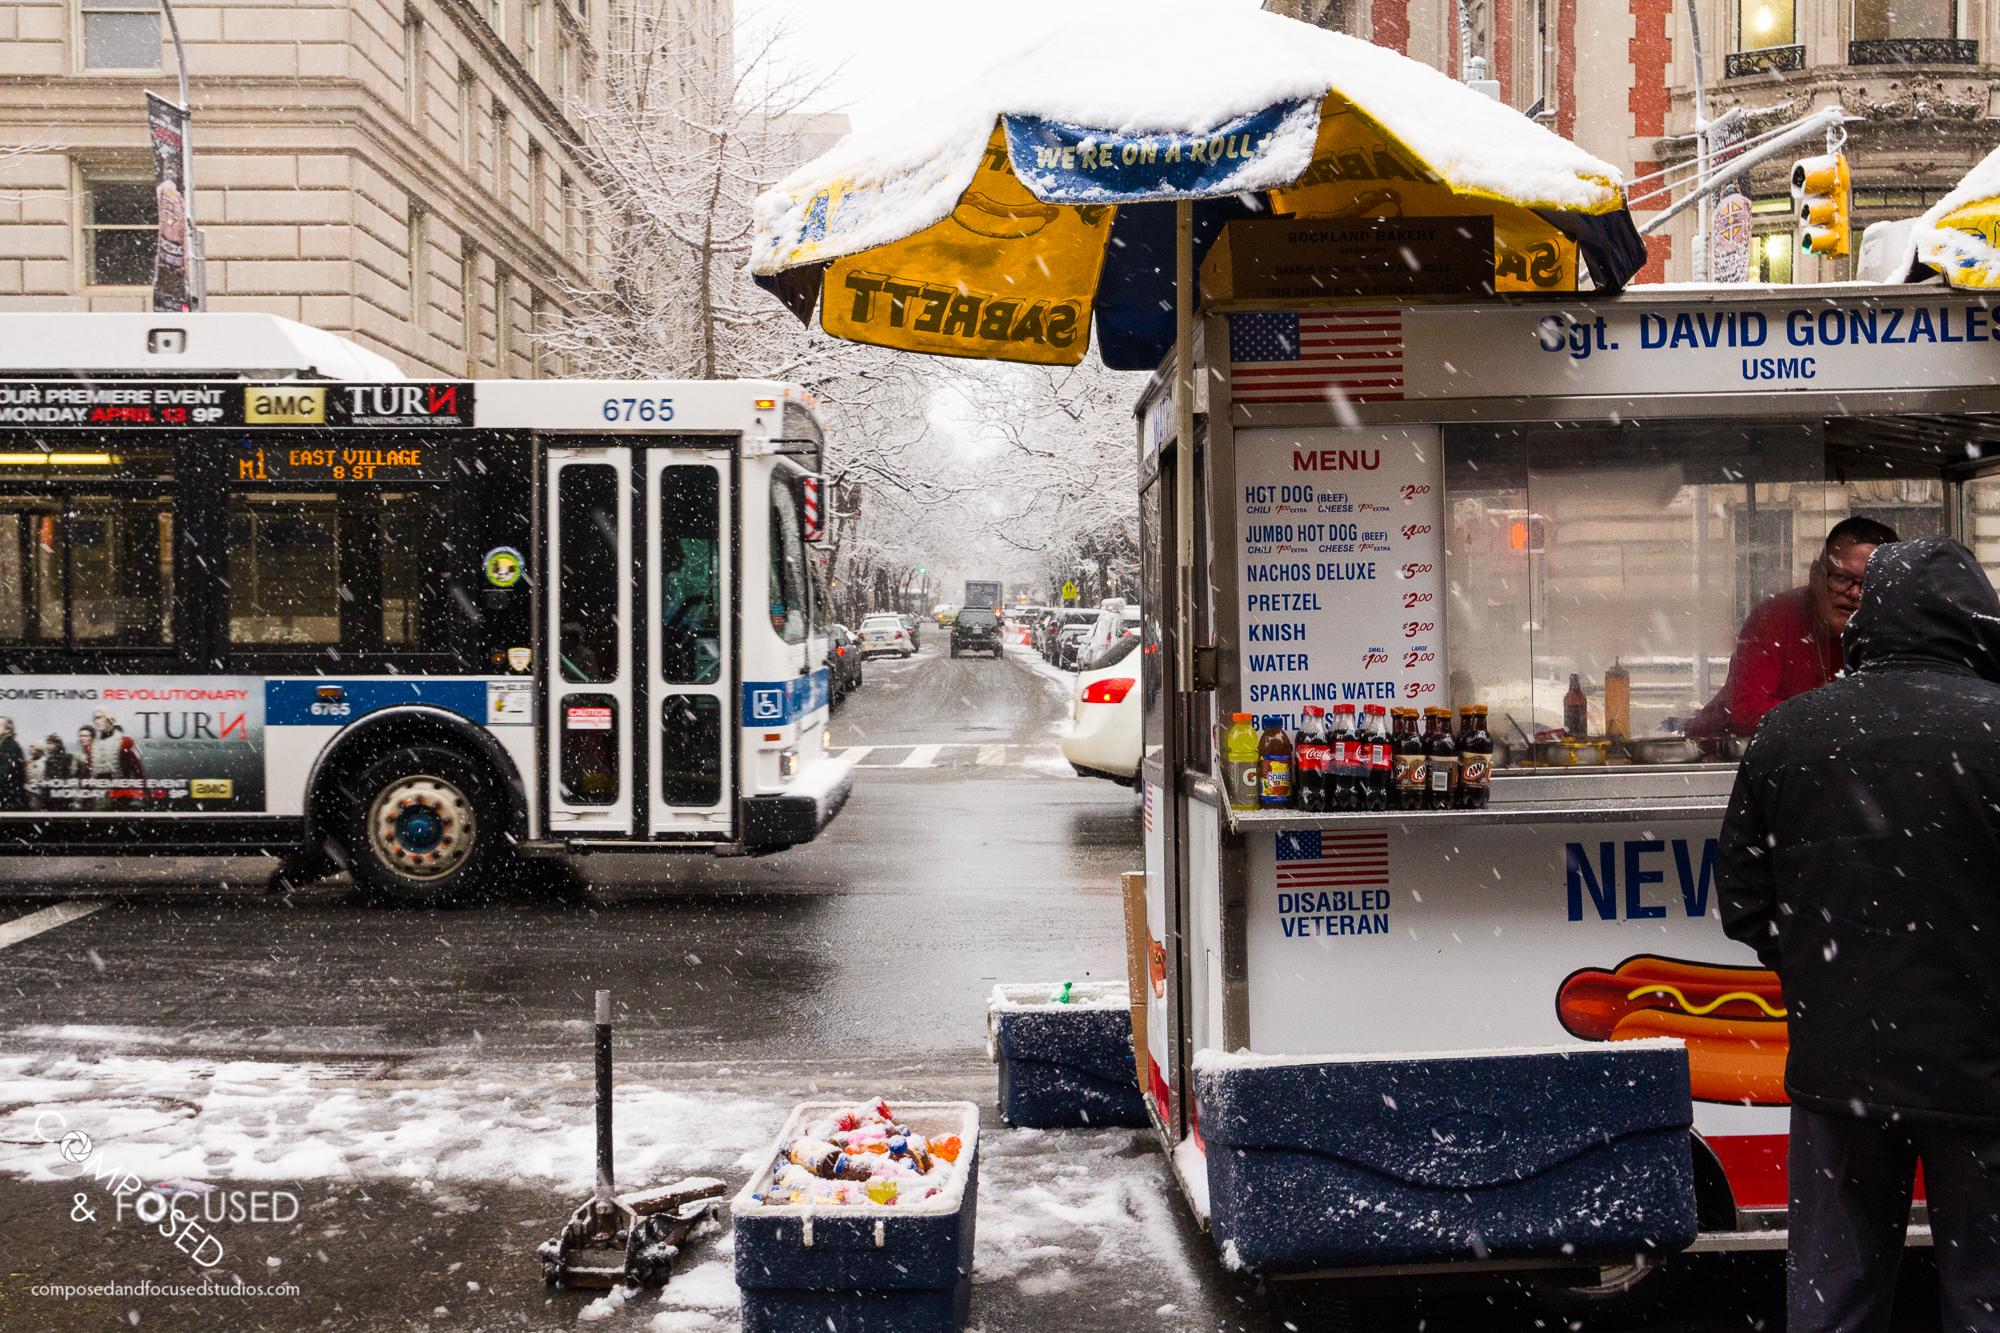 Street Vendor in a New York Winter